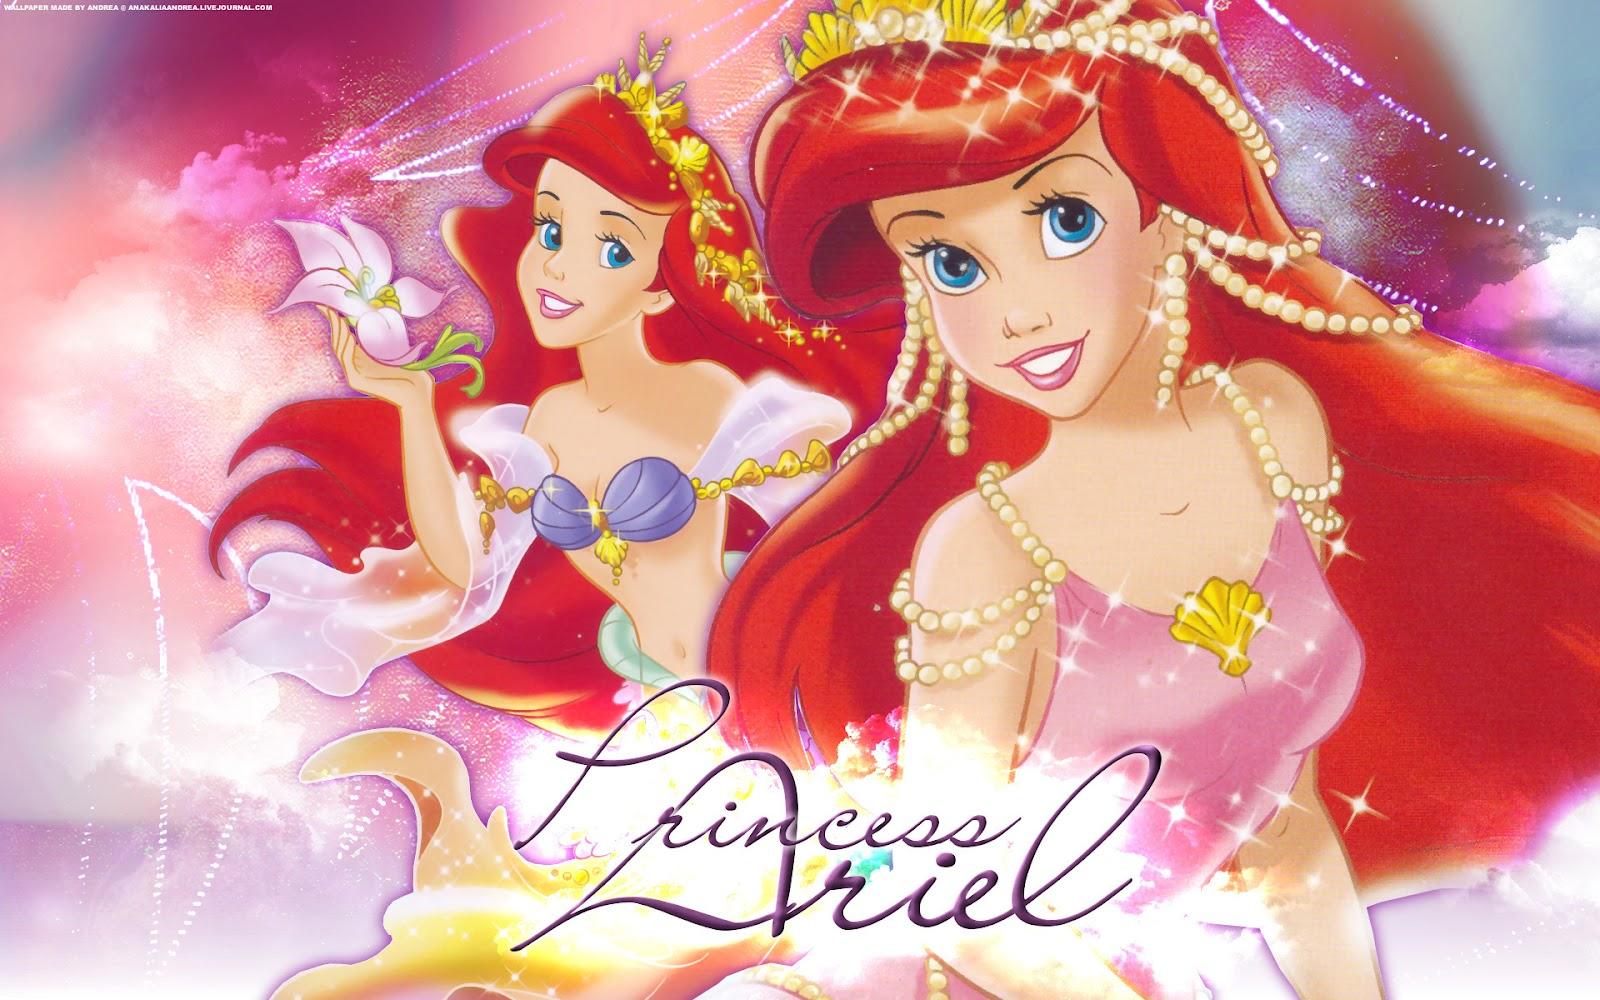 11 beautifull litle mermaid disney princess ariel characters. Black Bedroom Furniture Sets. Home Design Ideas